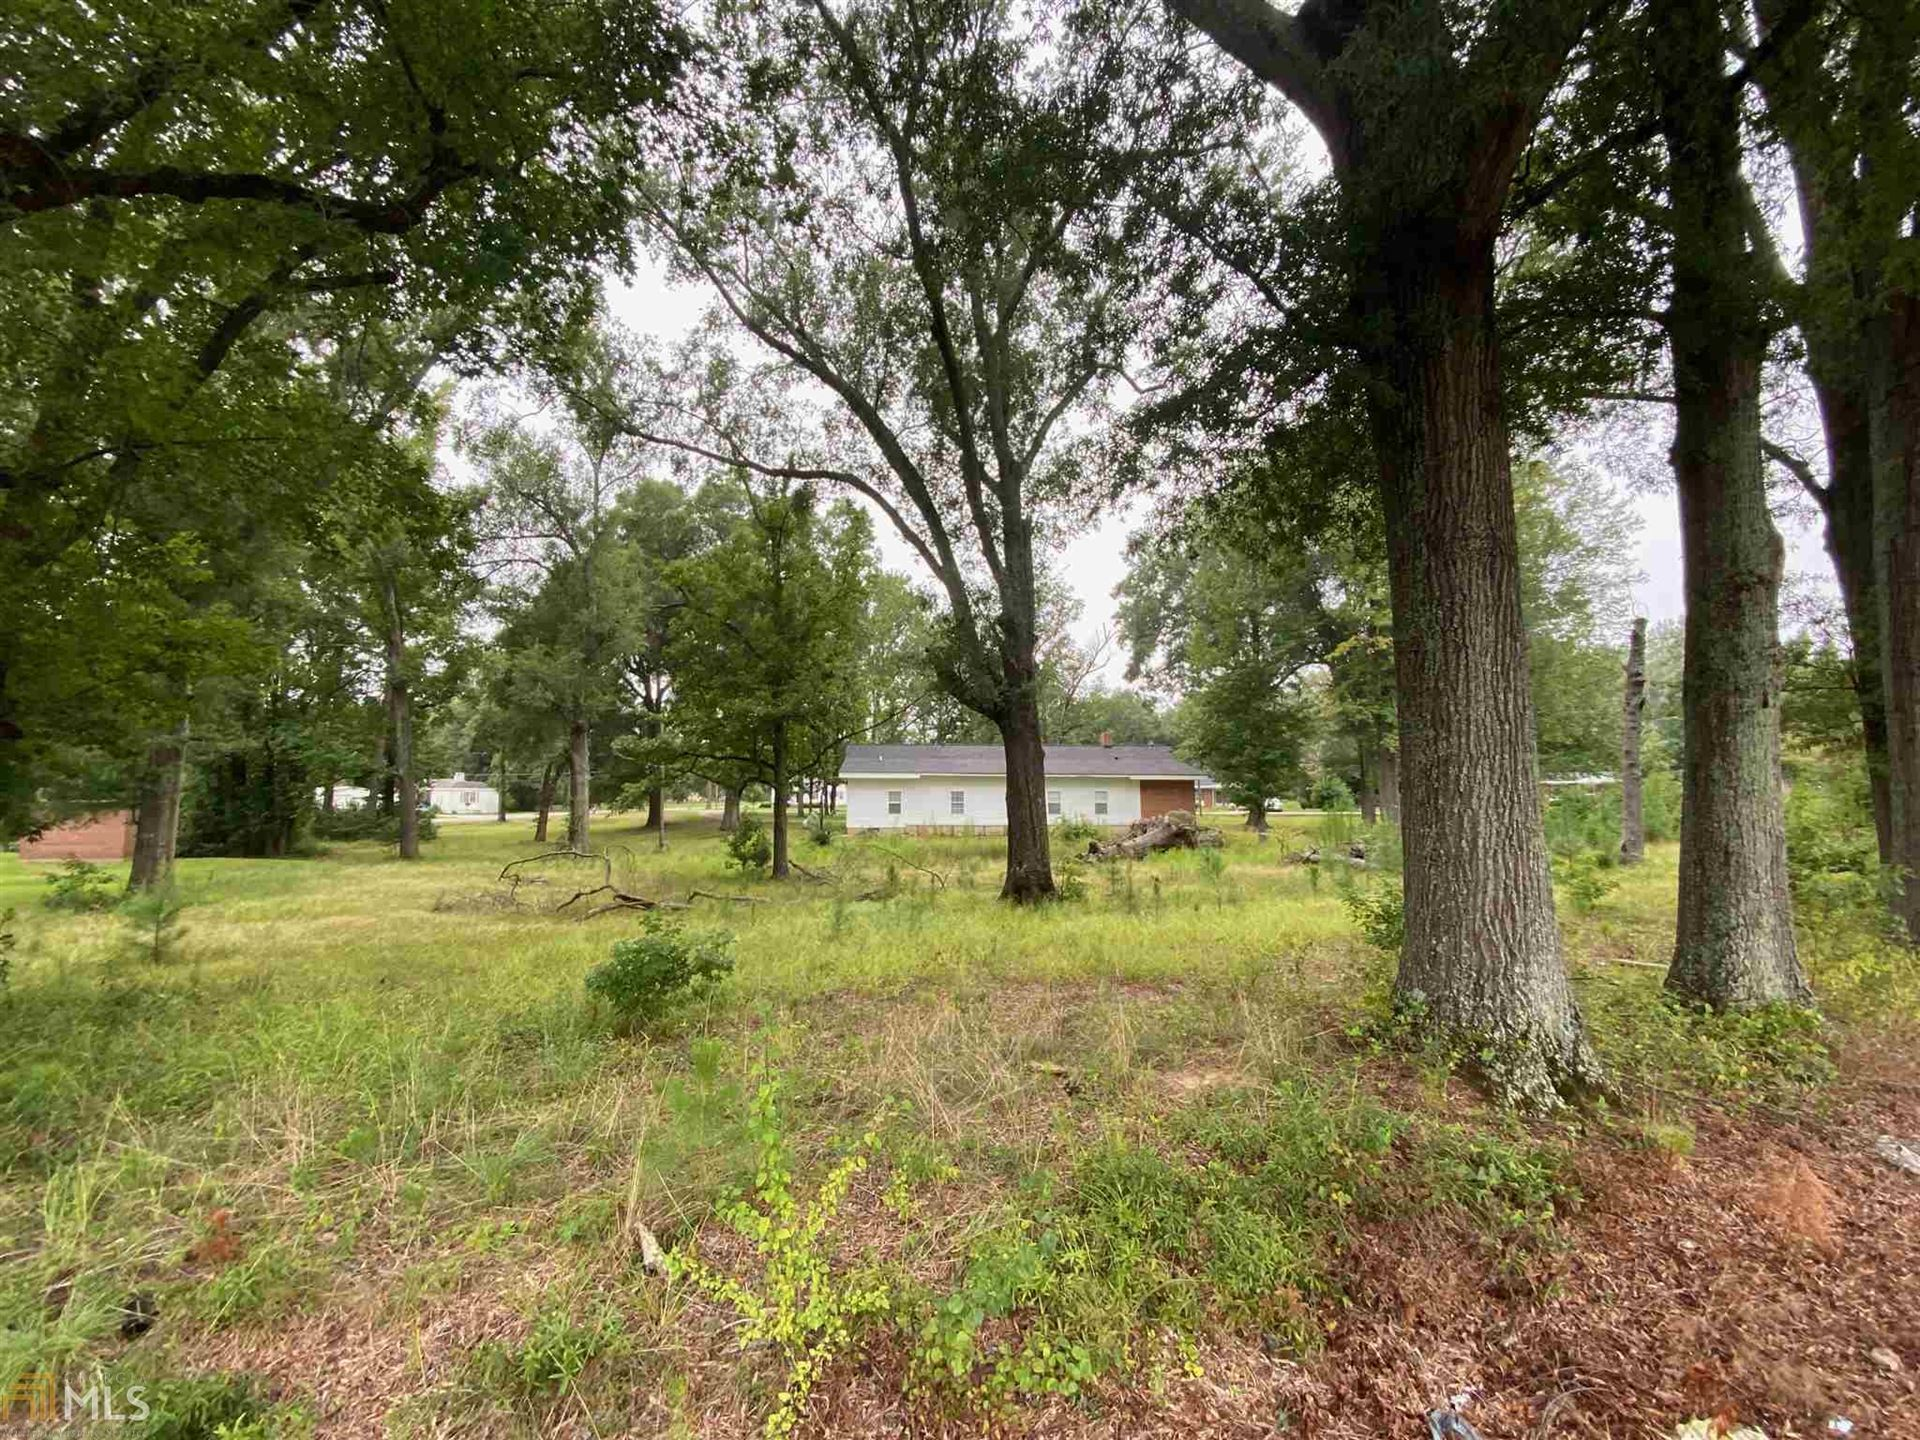 Photo of 419 Morningside Dr, Sandersville, GA 31082 (MLS # 8903911)